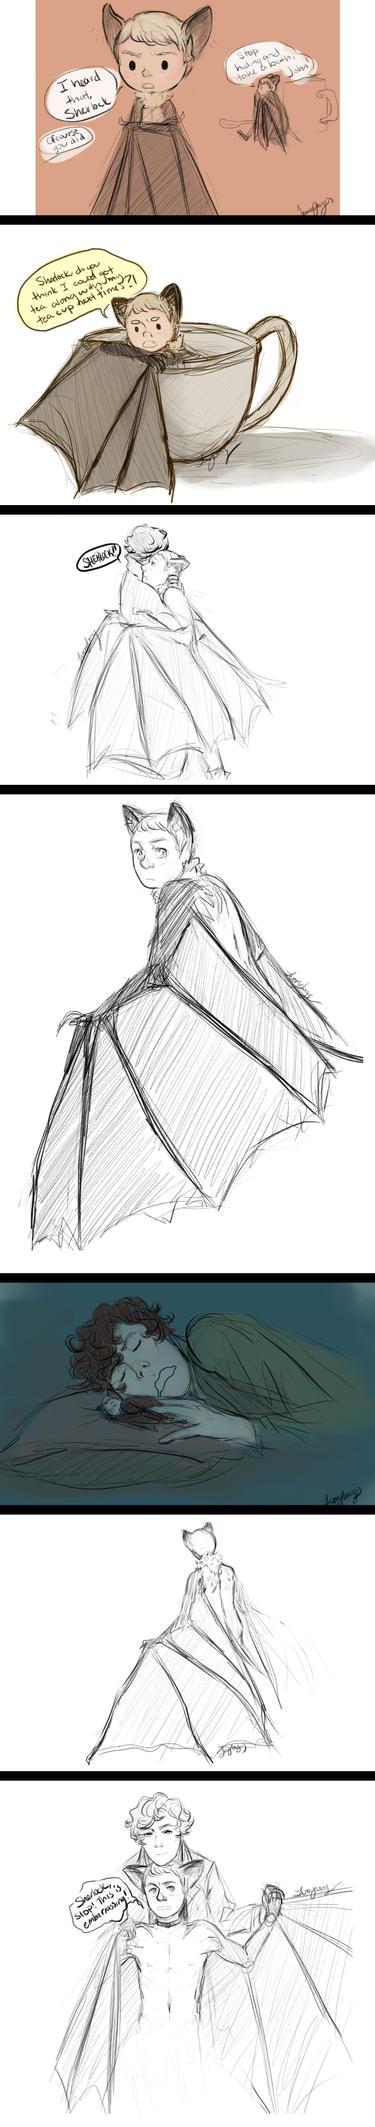 Batjohn Doodles~ by DaintyMendax